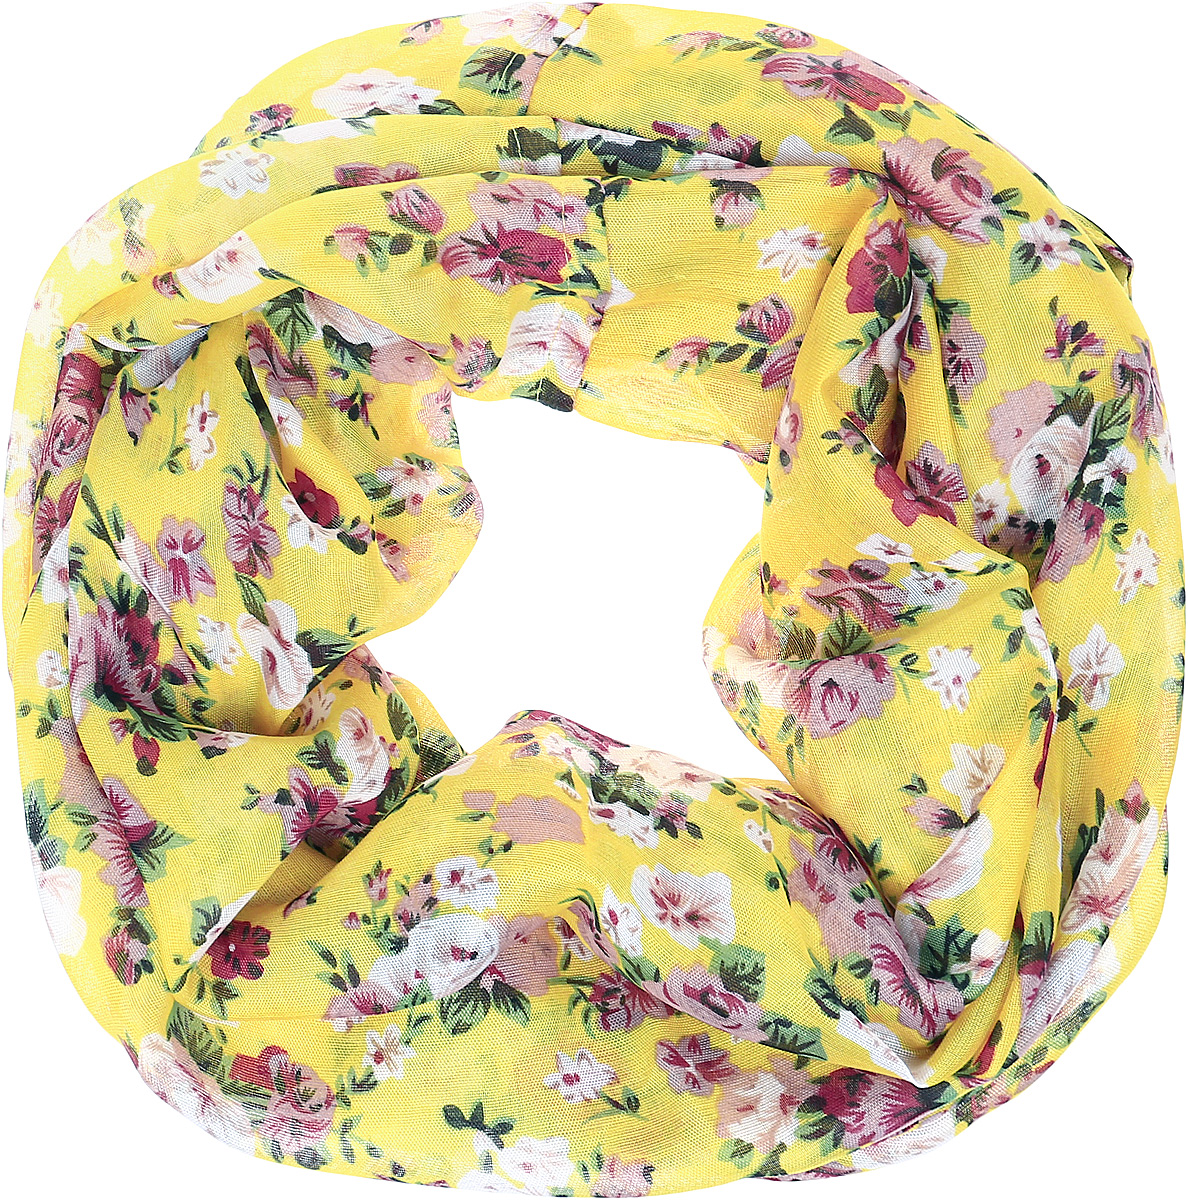 Снуд женский Vittorio Richi, цвет: желтый. Ro02PC3054/32-8. Размер 70 см х 90 смRo02PC3054/32-8Снуд из легкой хлопкоподобной ткани. Принт.